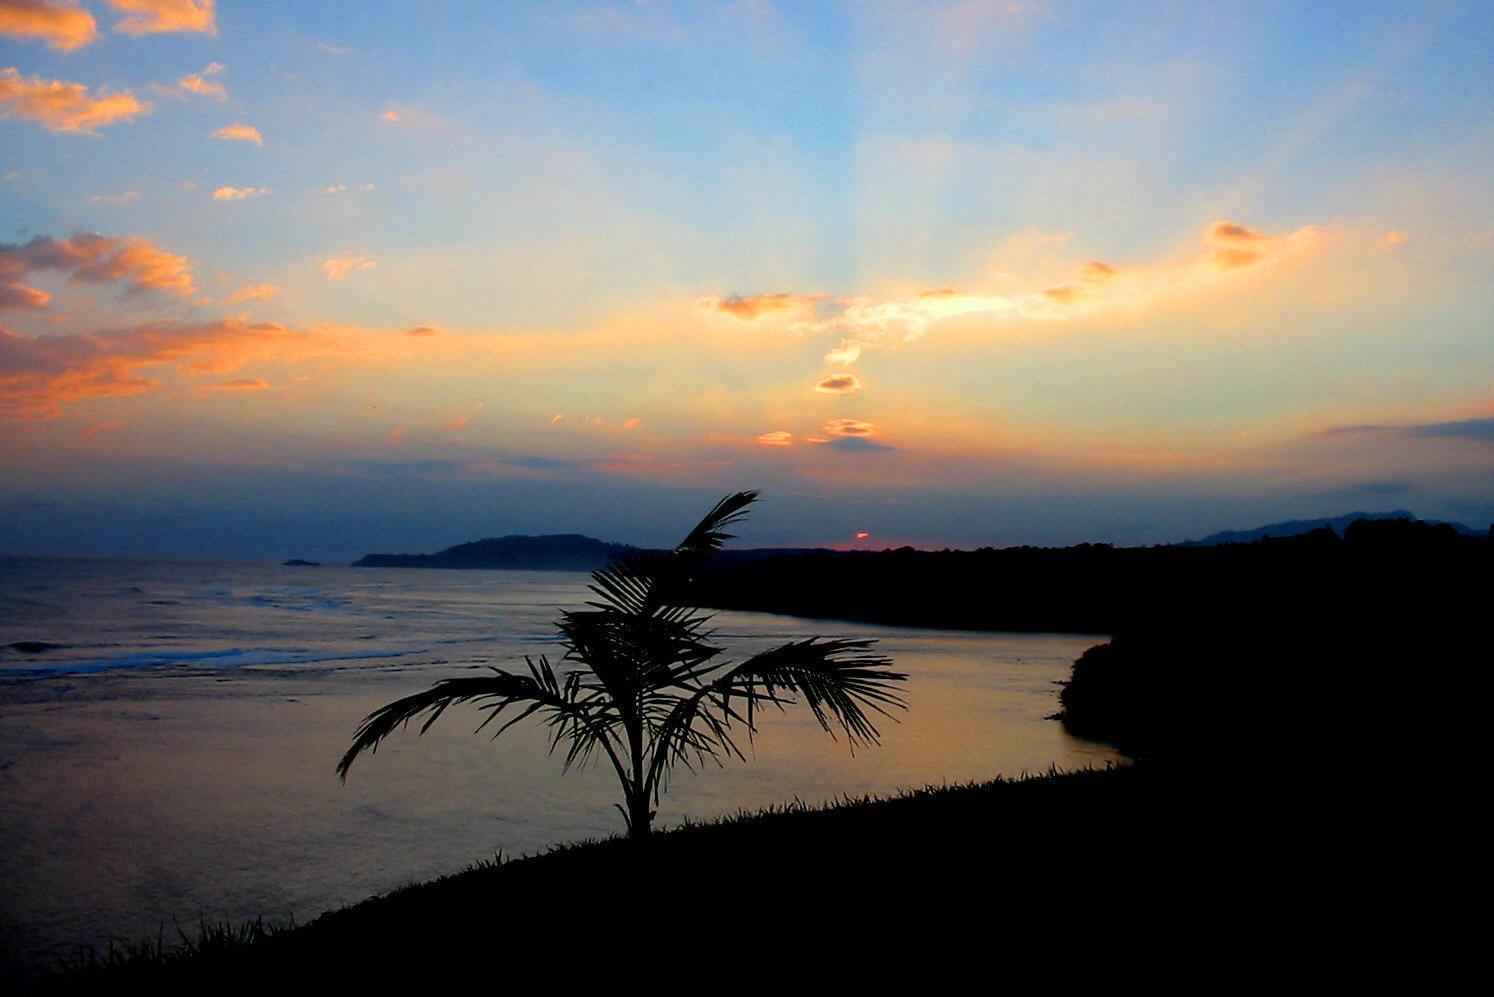 Sunrise from Sea Lodge Condominiums